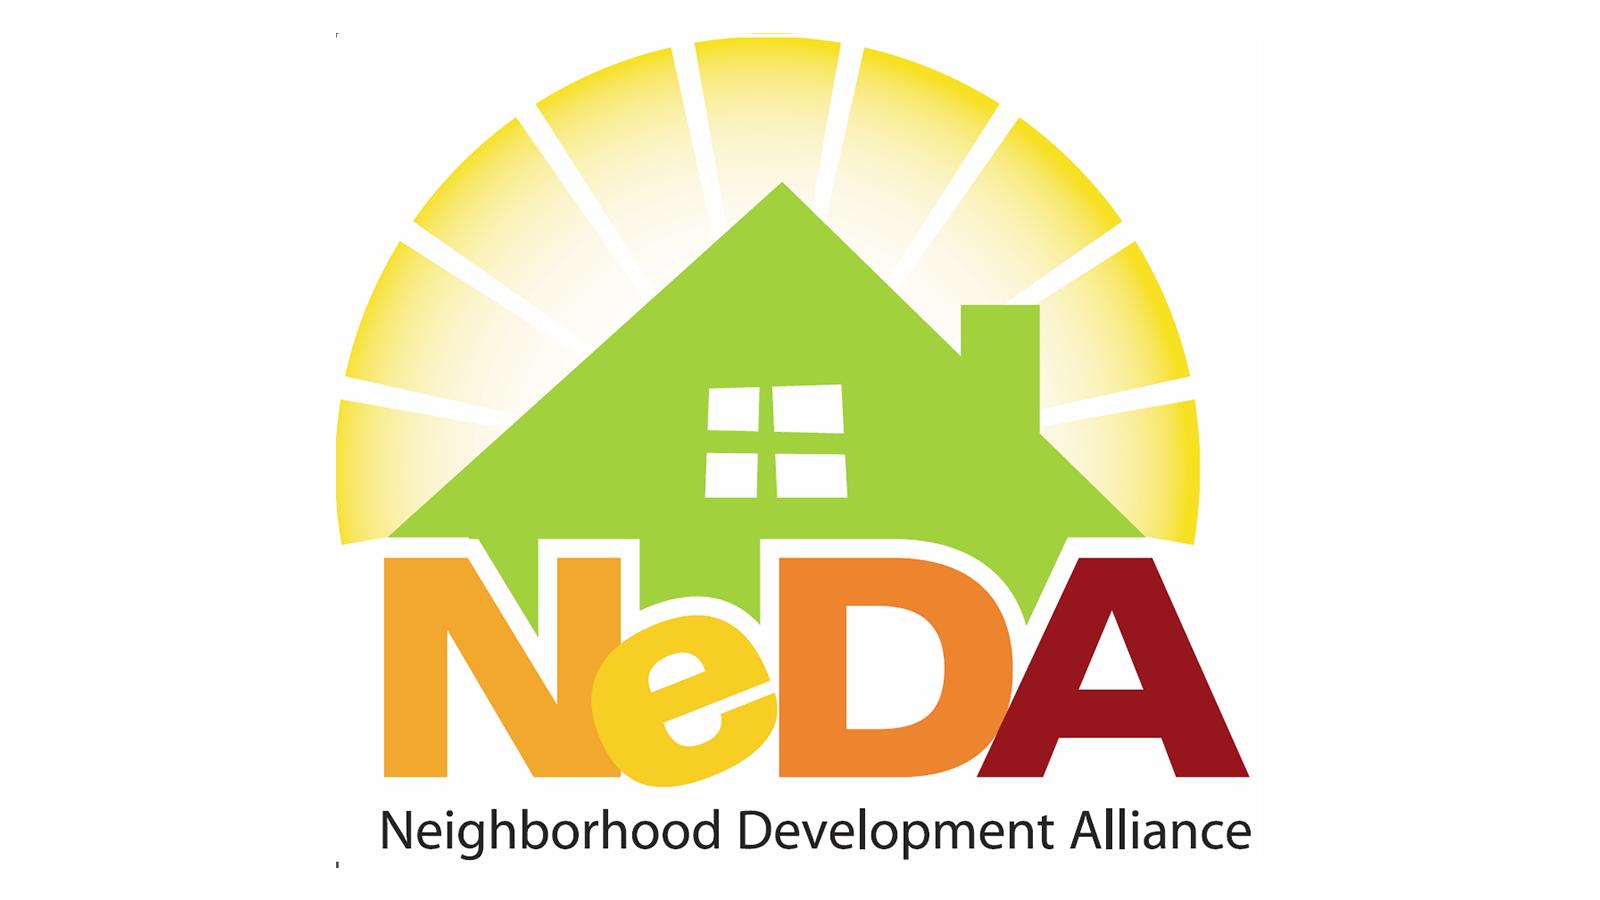 Neighborhood Development Alliance